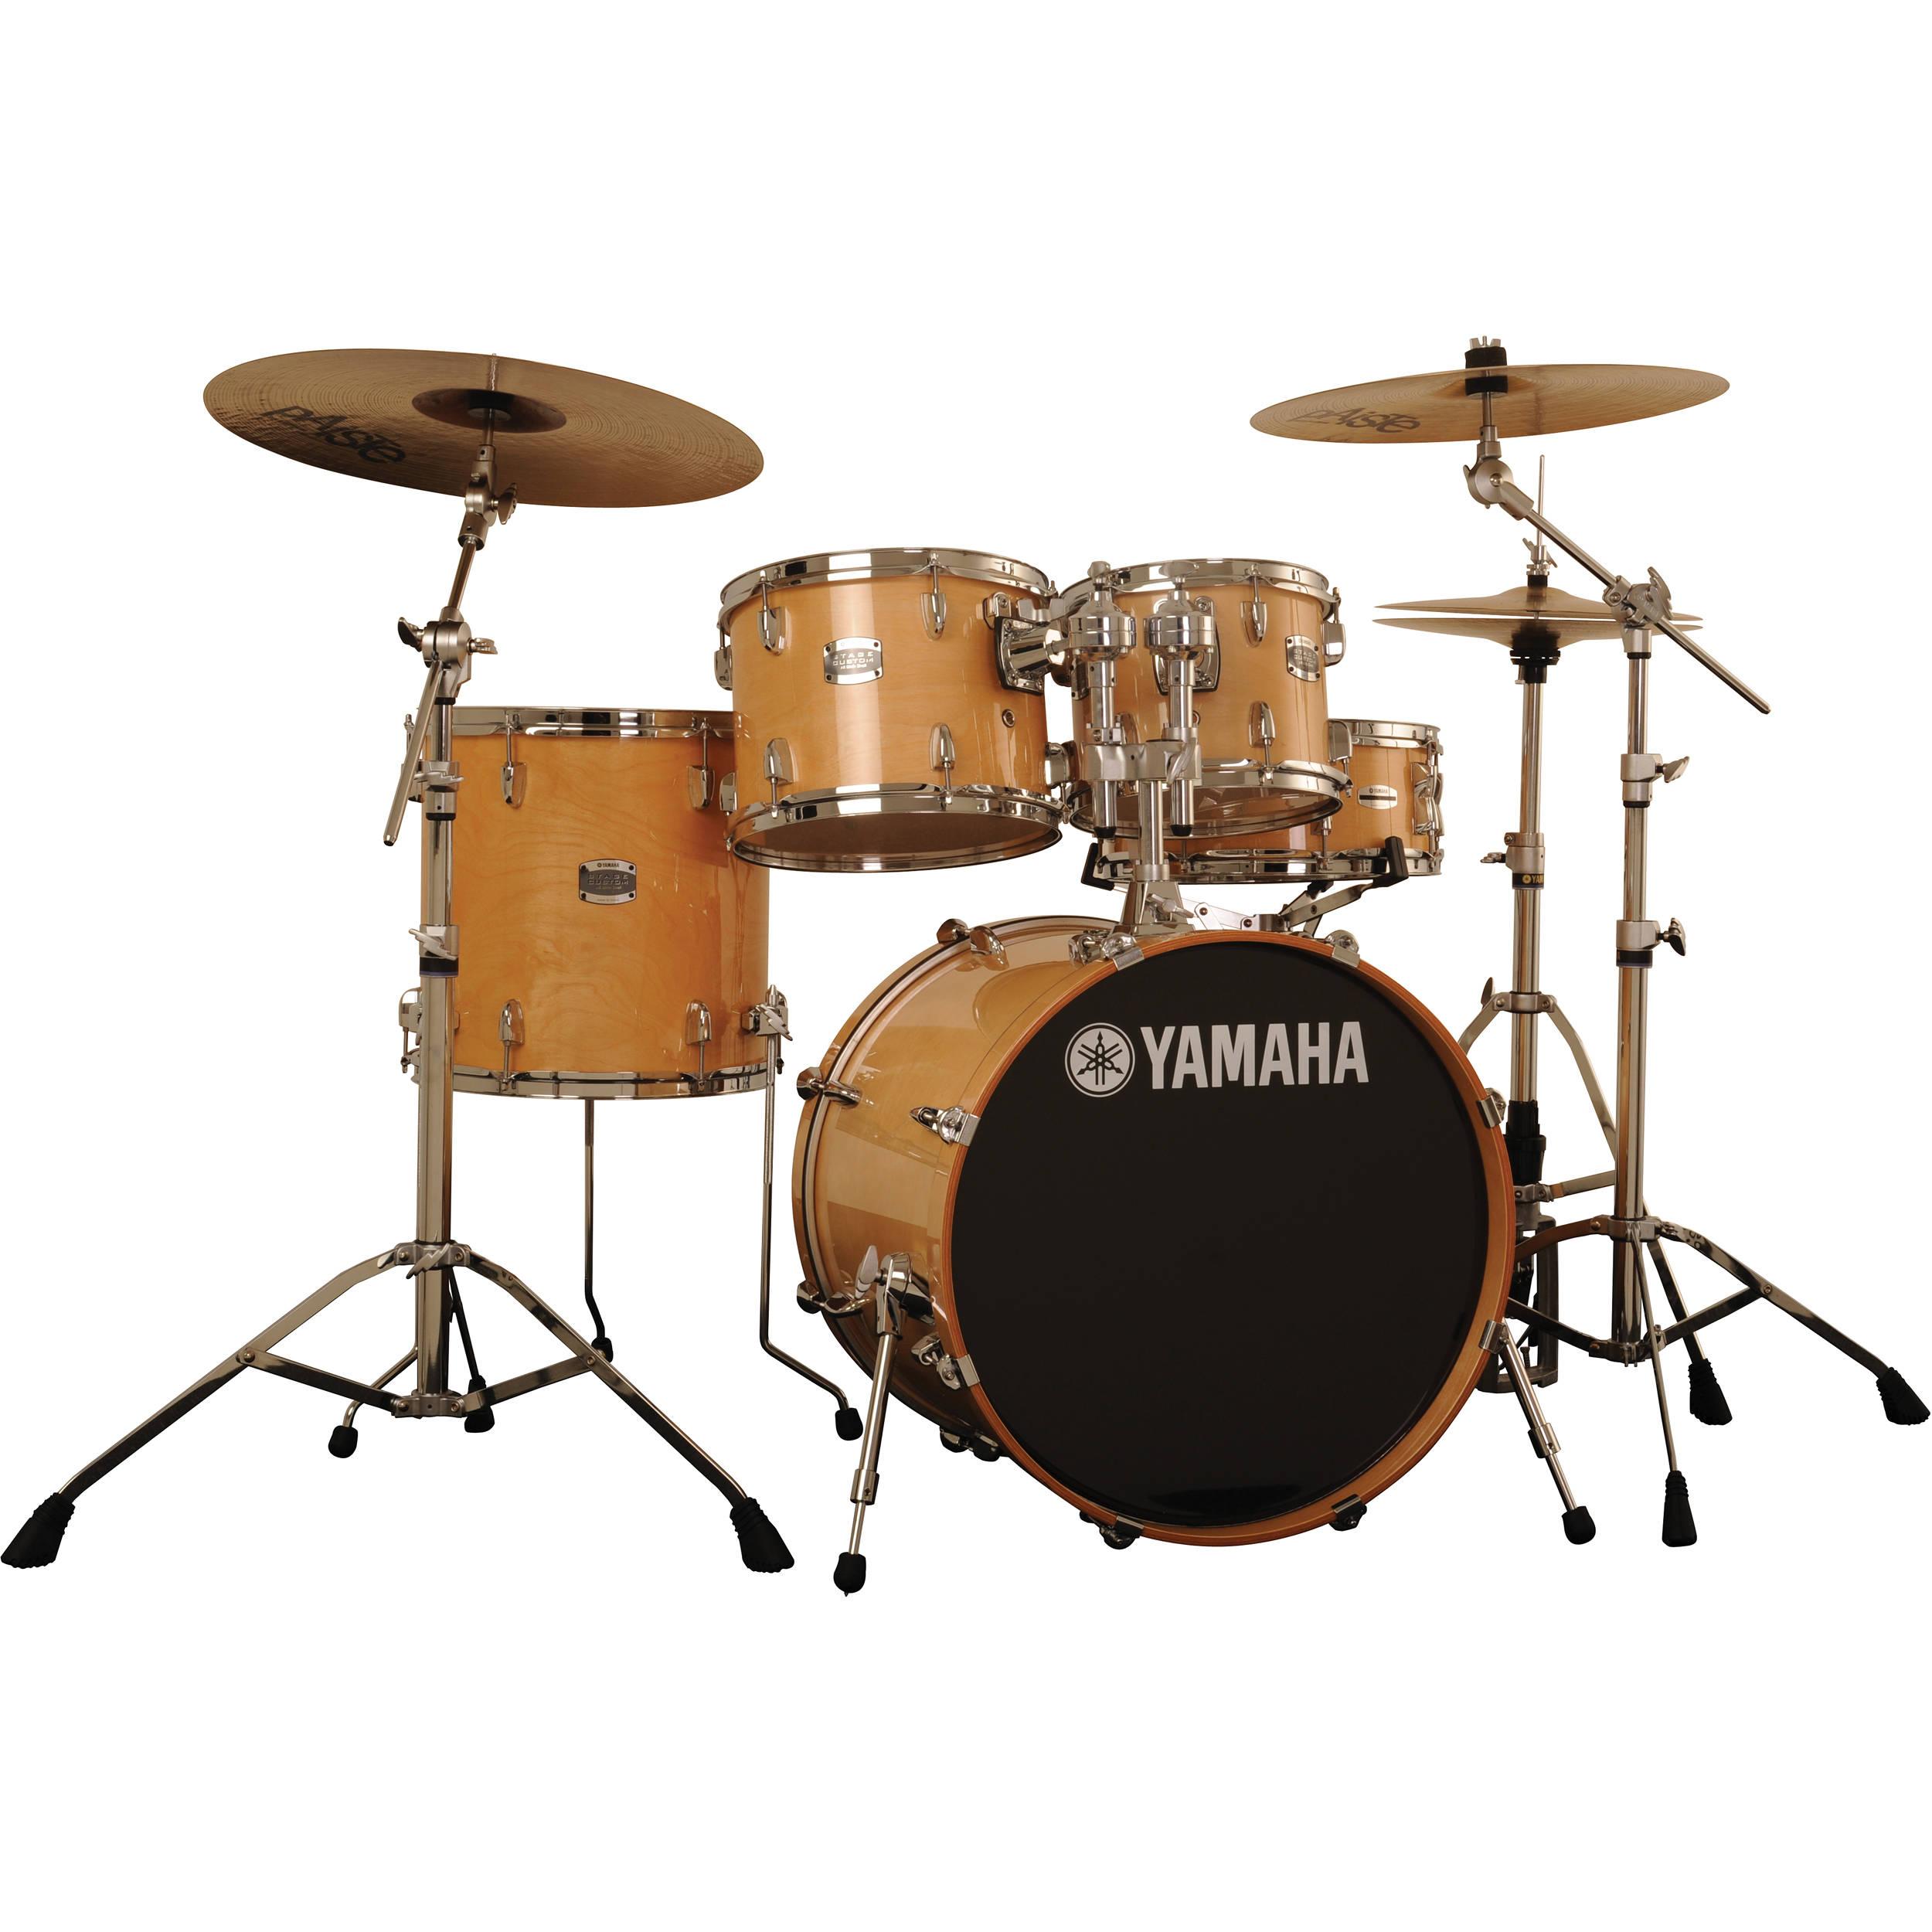 yamaha sbp2f5 stage custom birch acoustic 5 piece drum sbp2f50nw. Black Bedroom Furniture Sets. Home Design Ideas